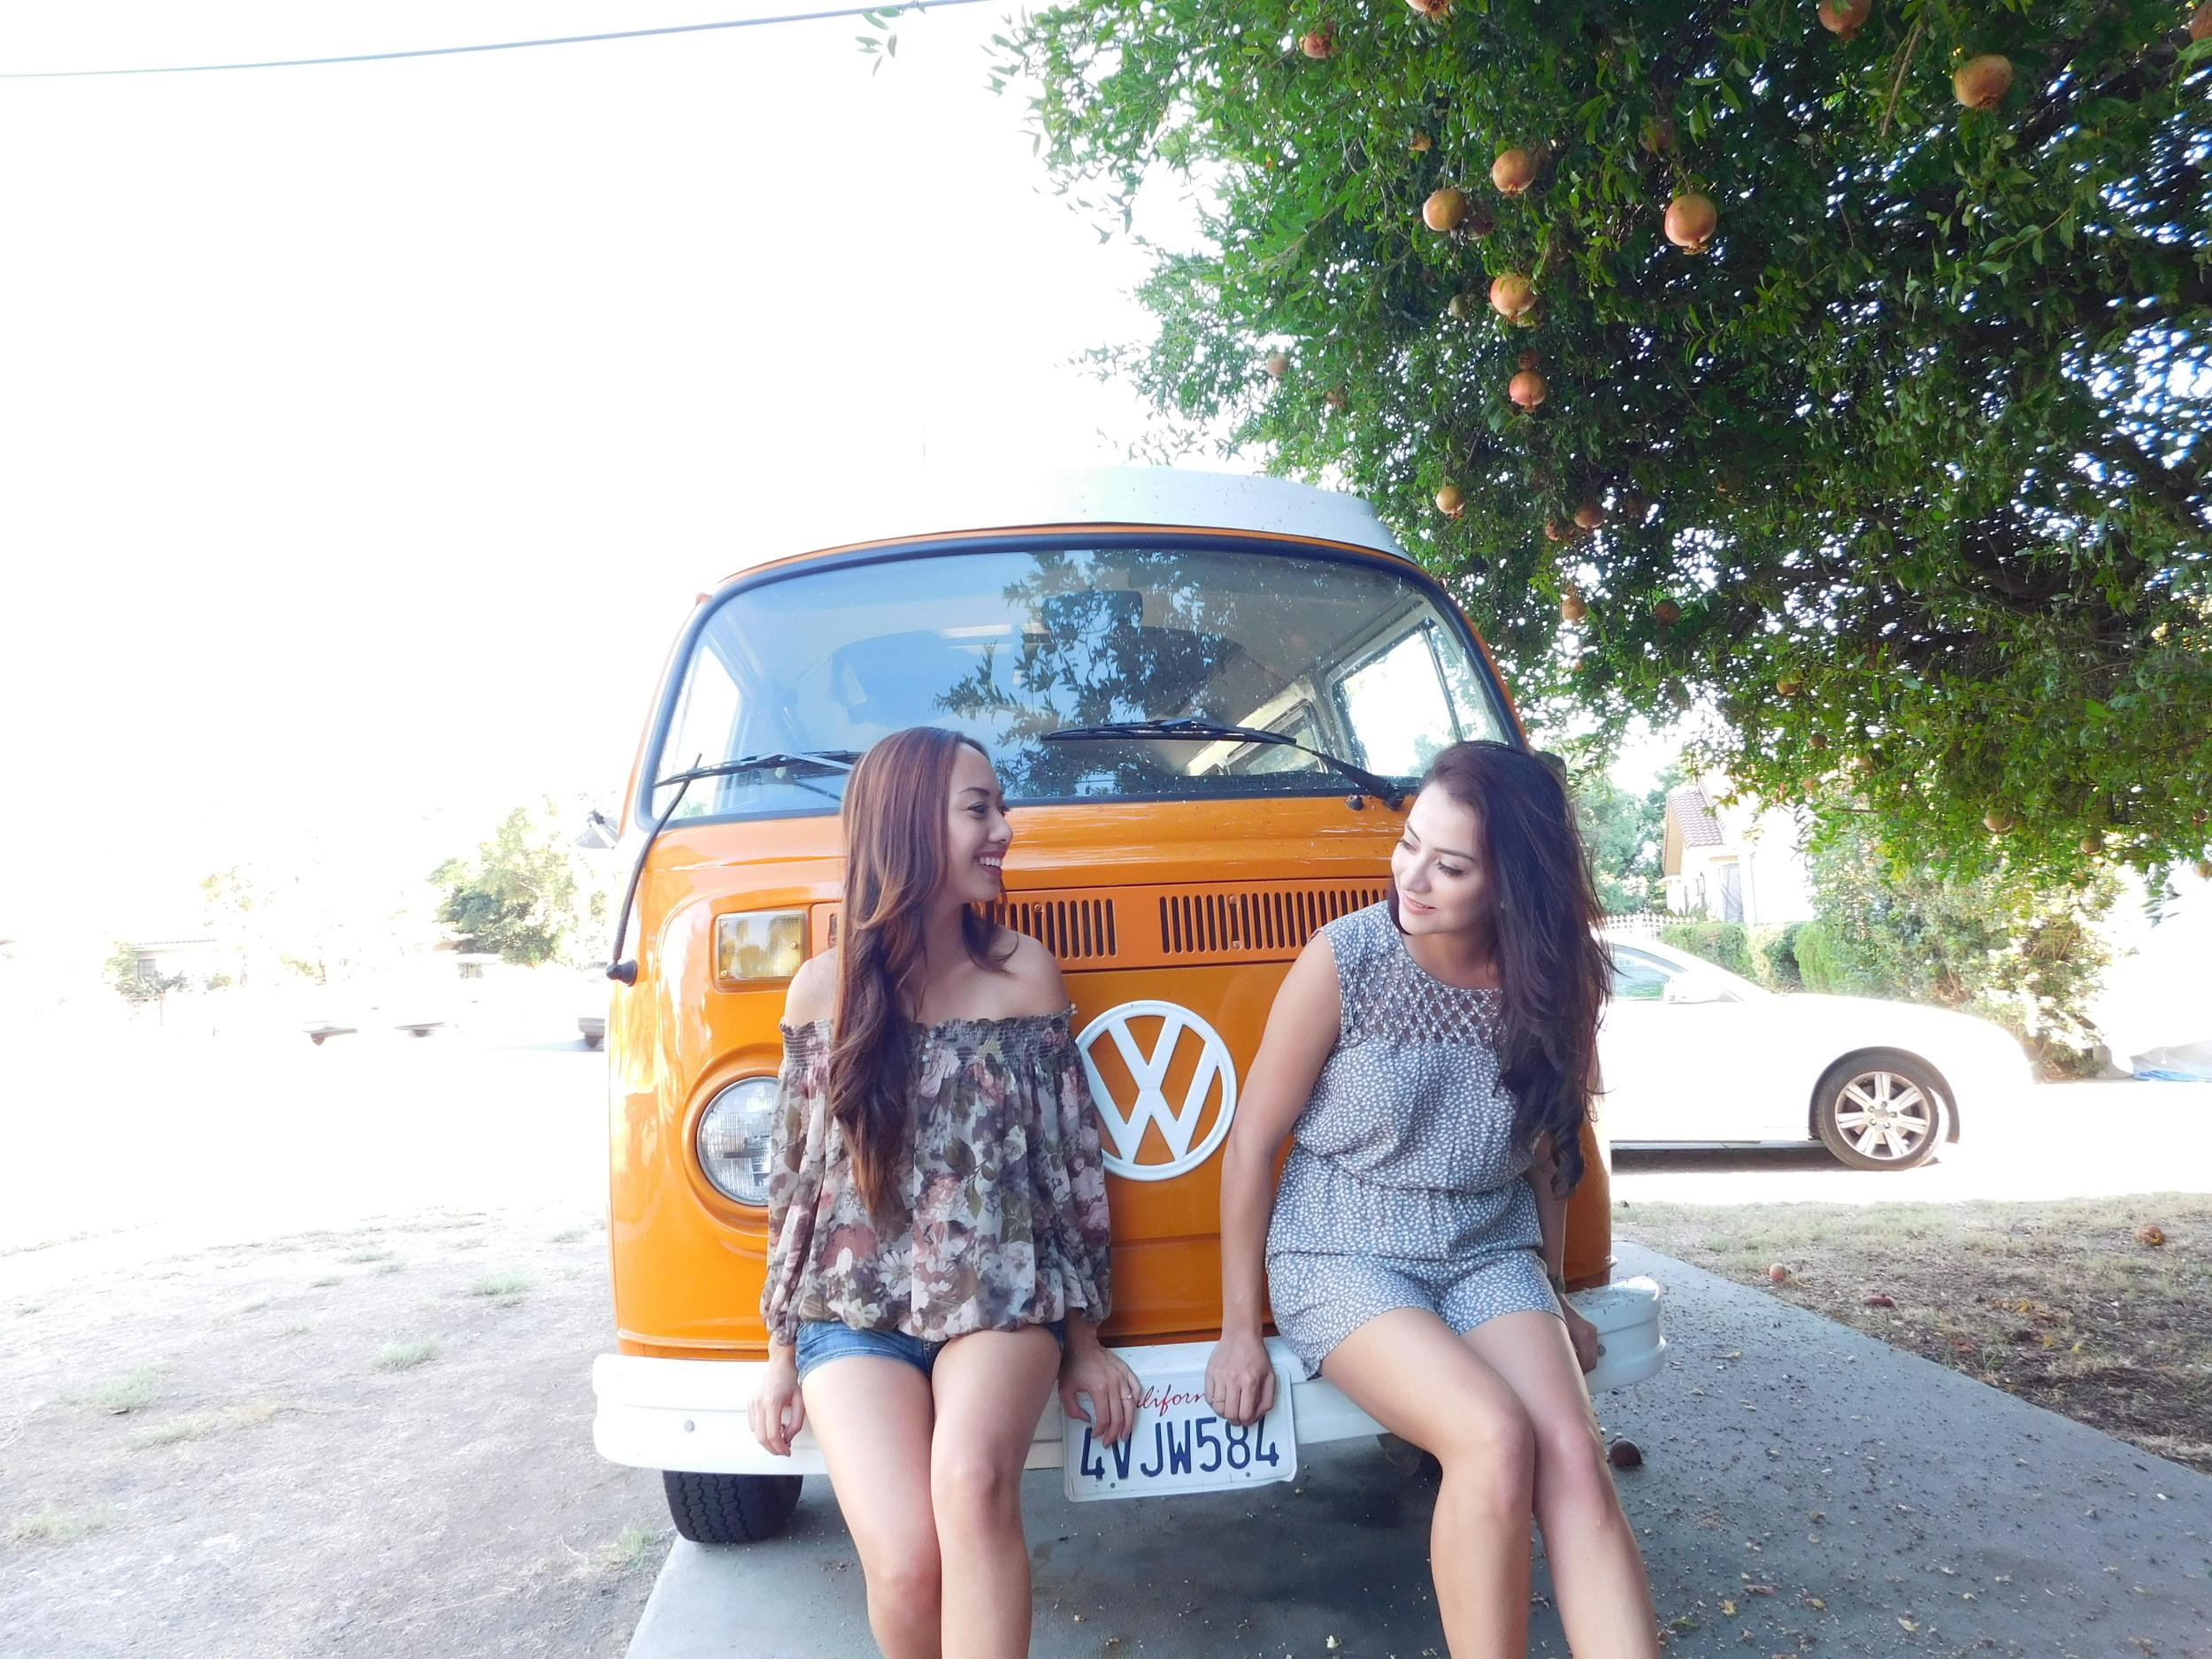 We found this 60's van around Cristina's neighborhood. How CUTE is it?!